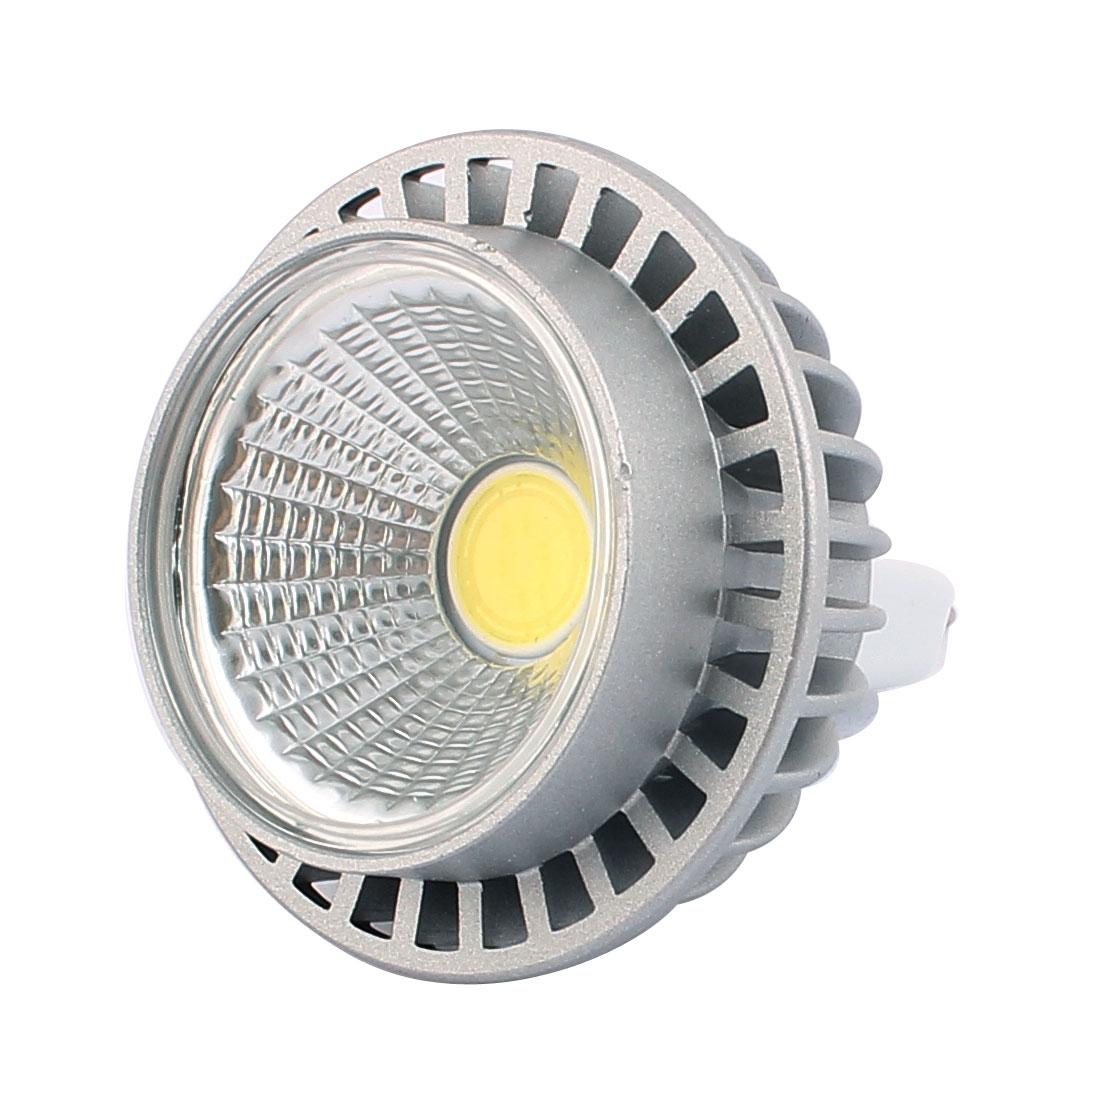 DC12V 3W MR16 COB LED 240LM Spotlight Lamp Bulb Downlight Pure White